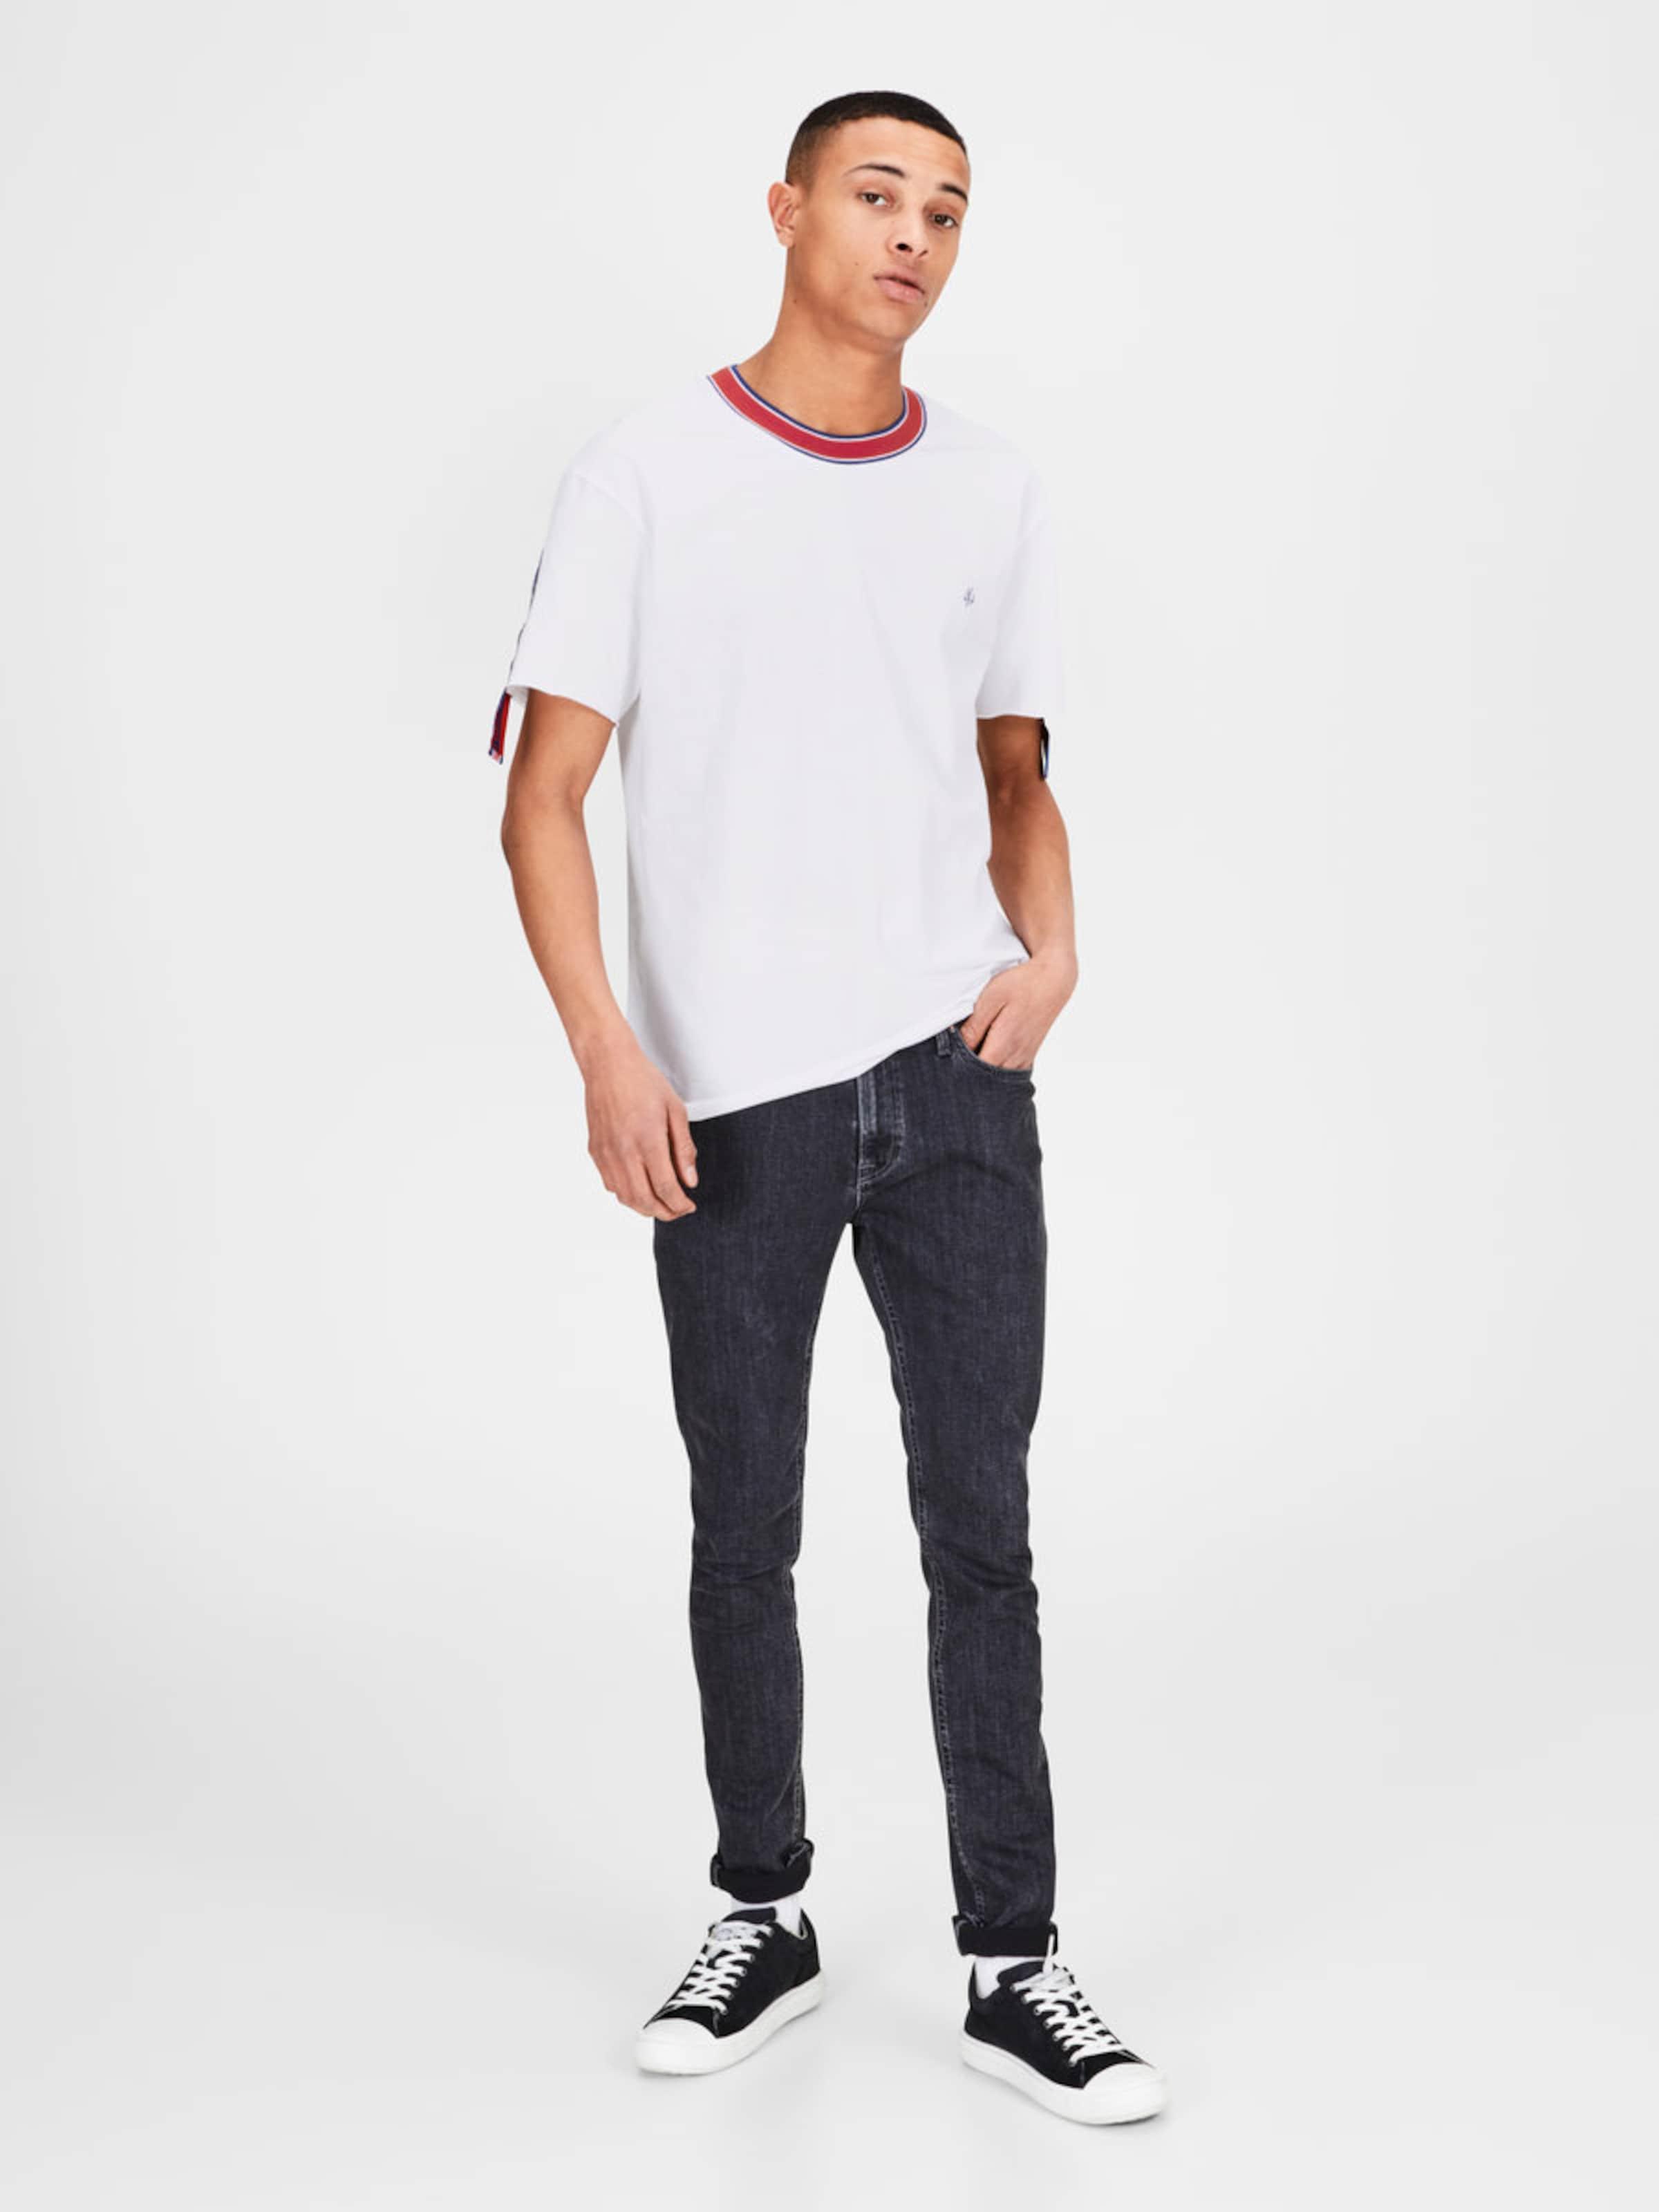 Günstiges Shop-Angebot JACK & JONES Grafik T-Shirt Billig Verkauf Sneakernews Spielraum Fabrikverkauf Günstig Kaufen Rabatt BbS7oG